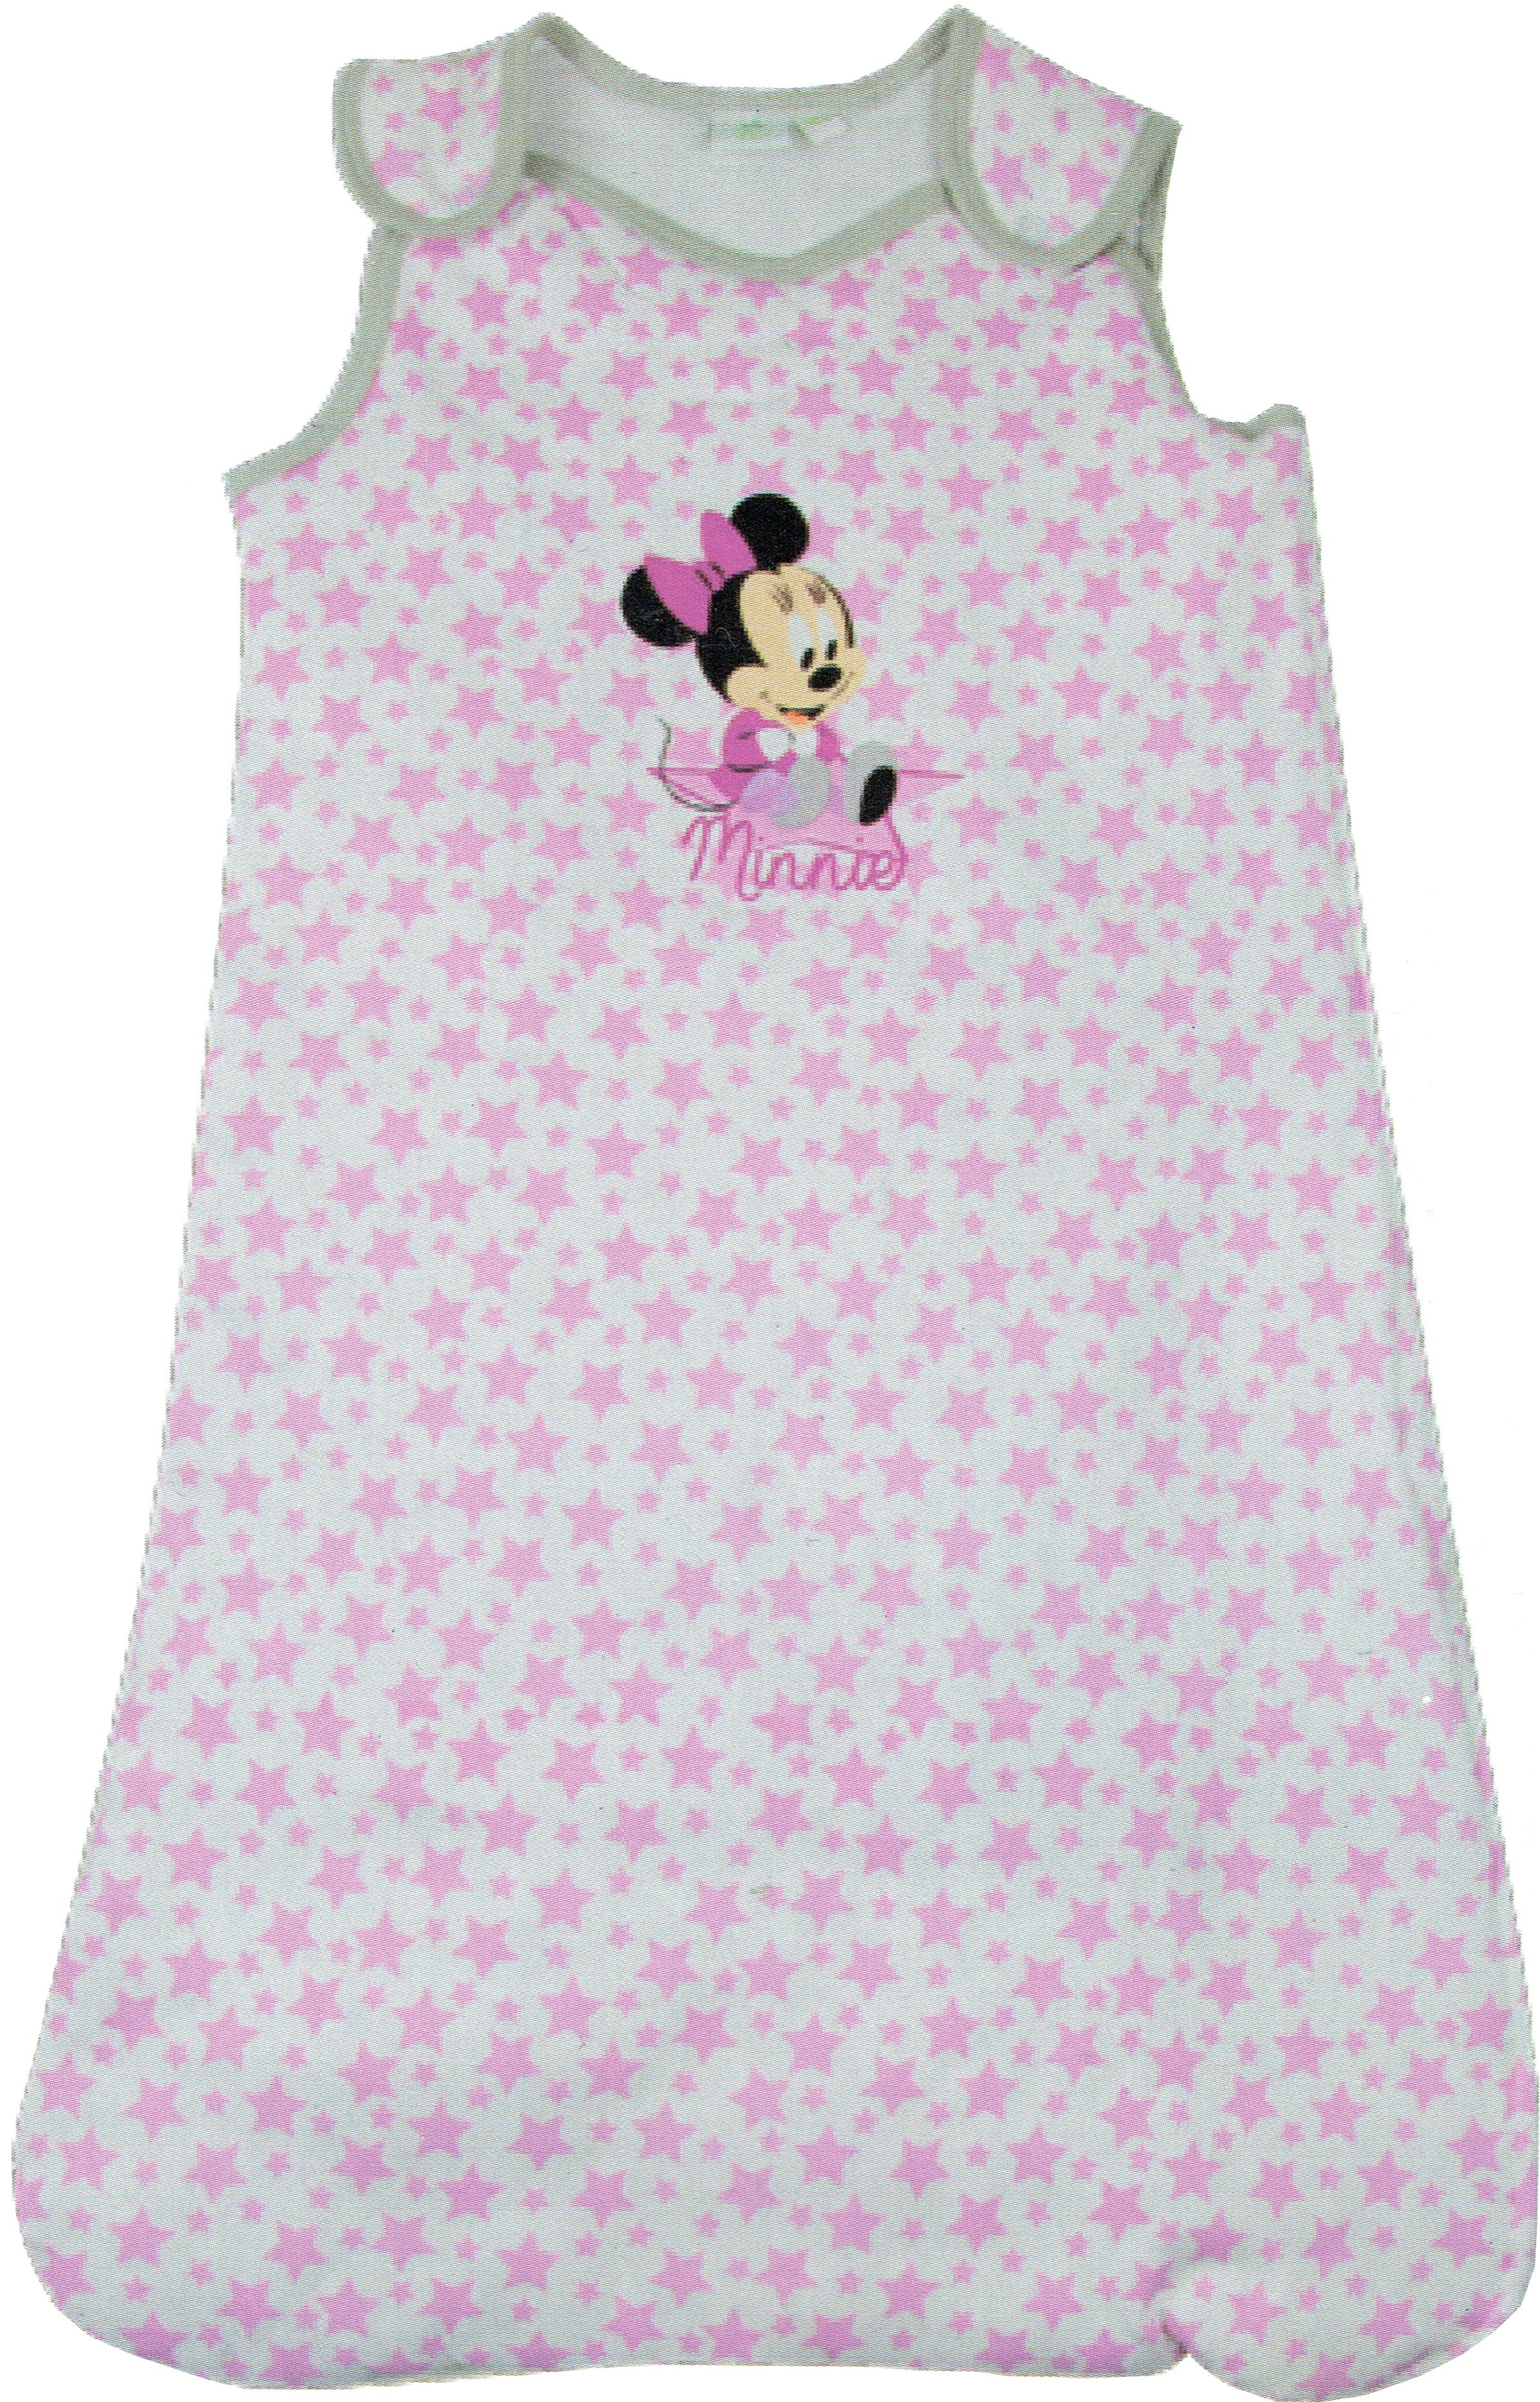 Baby-Schlafsack-Disney-Babybekleidung-Strampler-Strampelsack-Oko-Tex-Gr-70-90 Indexbild 4